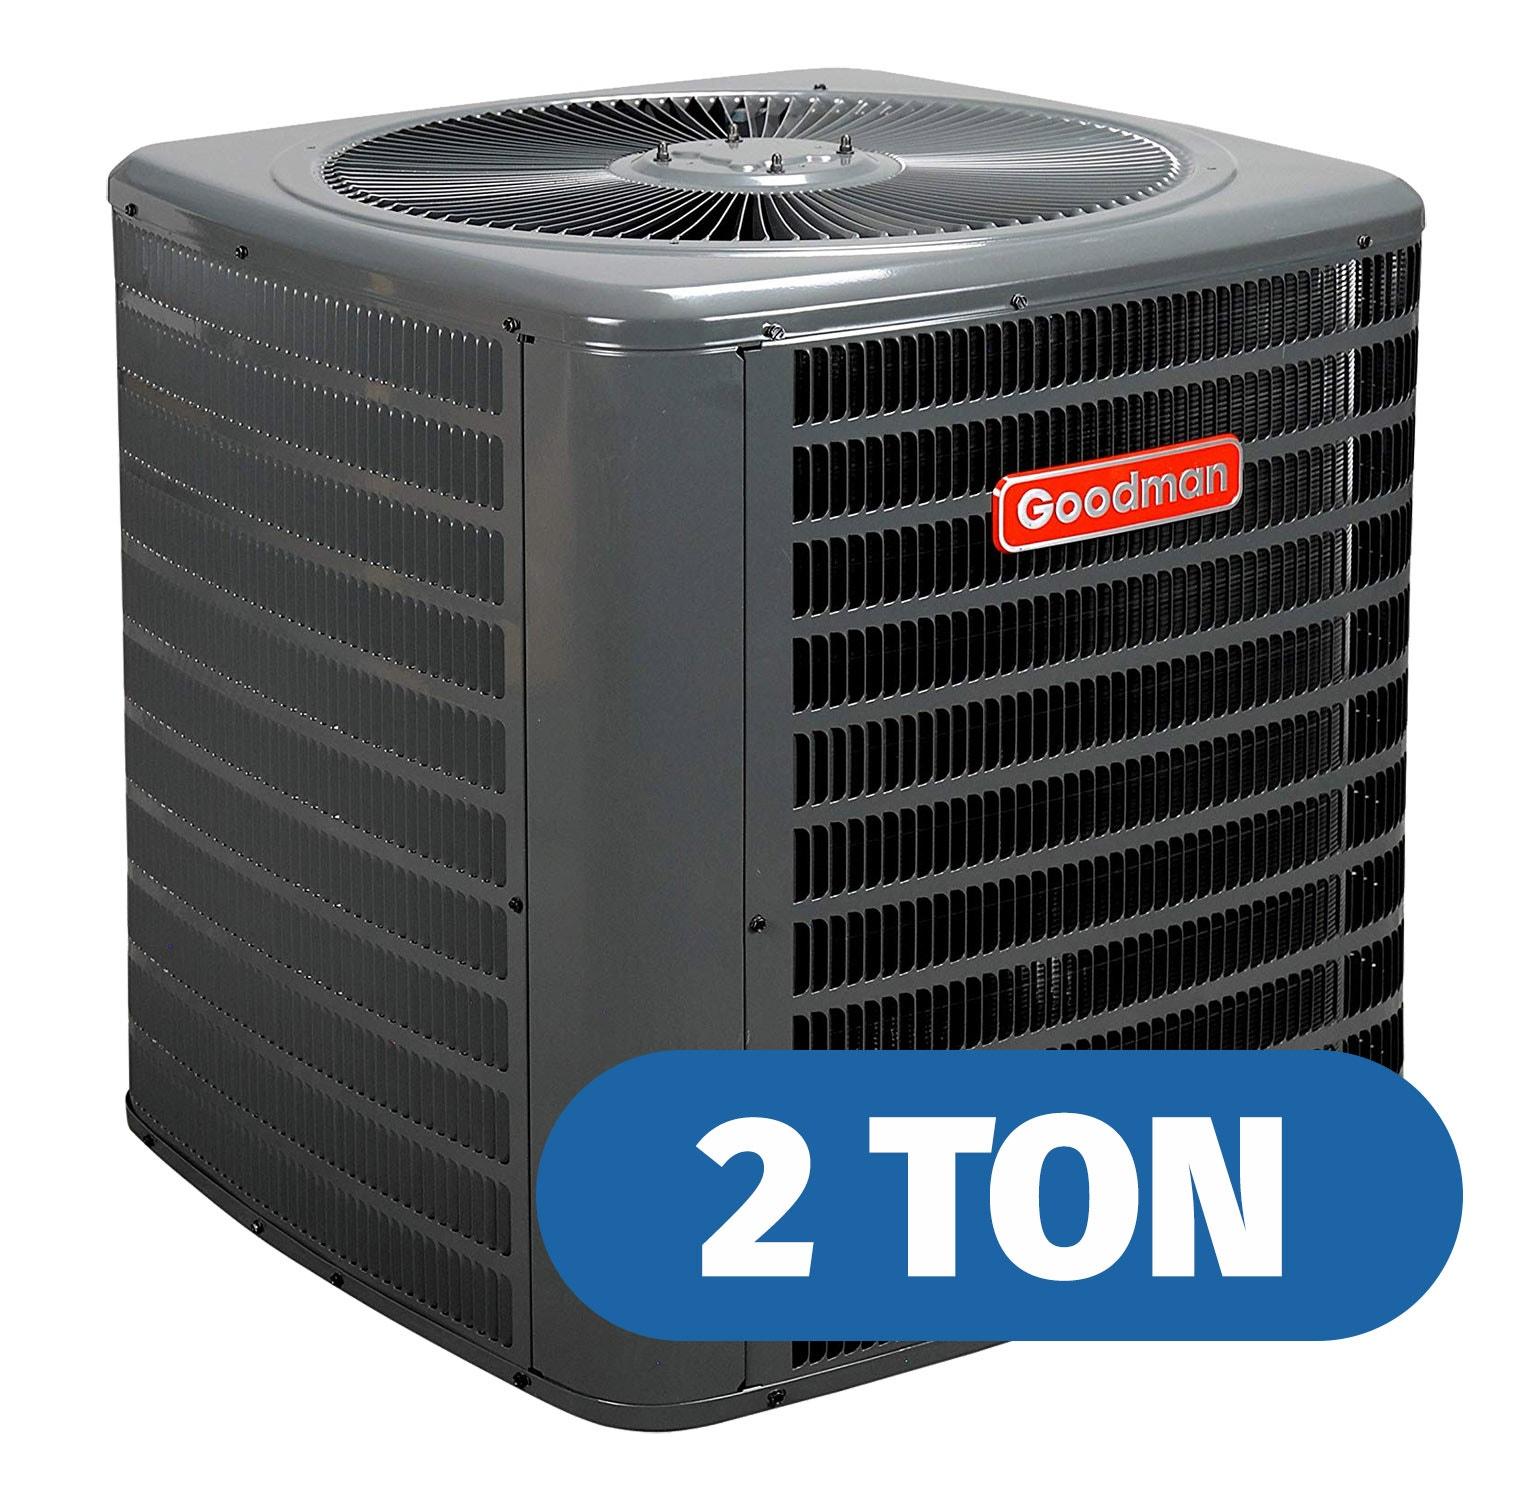 Goodman 2 Ton Heat Pumps